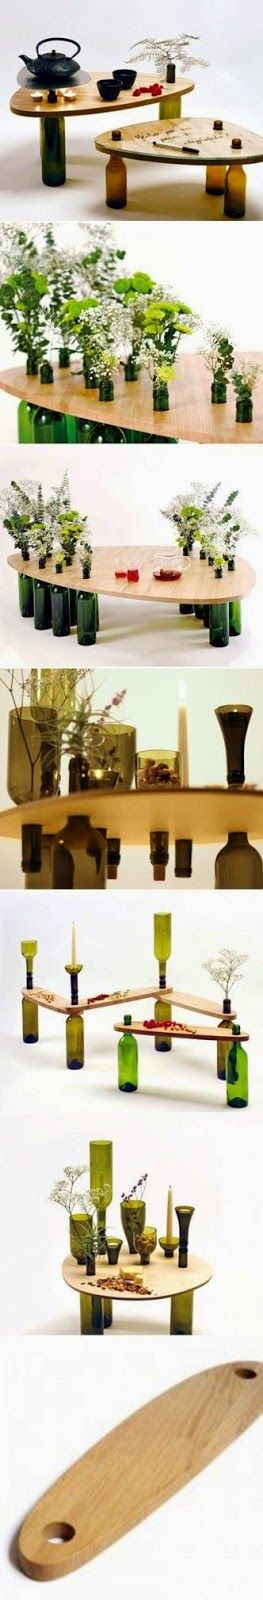 mesa de sobra de madeira e garrafas